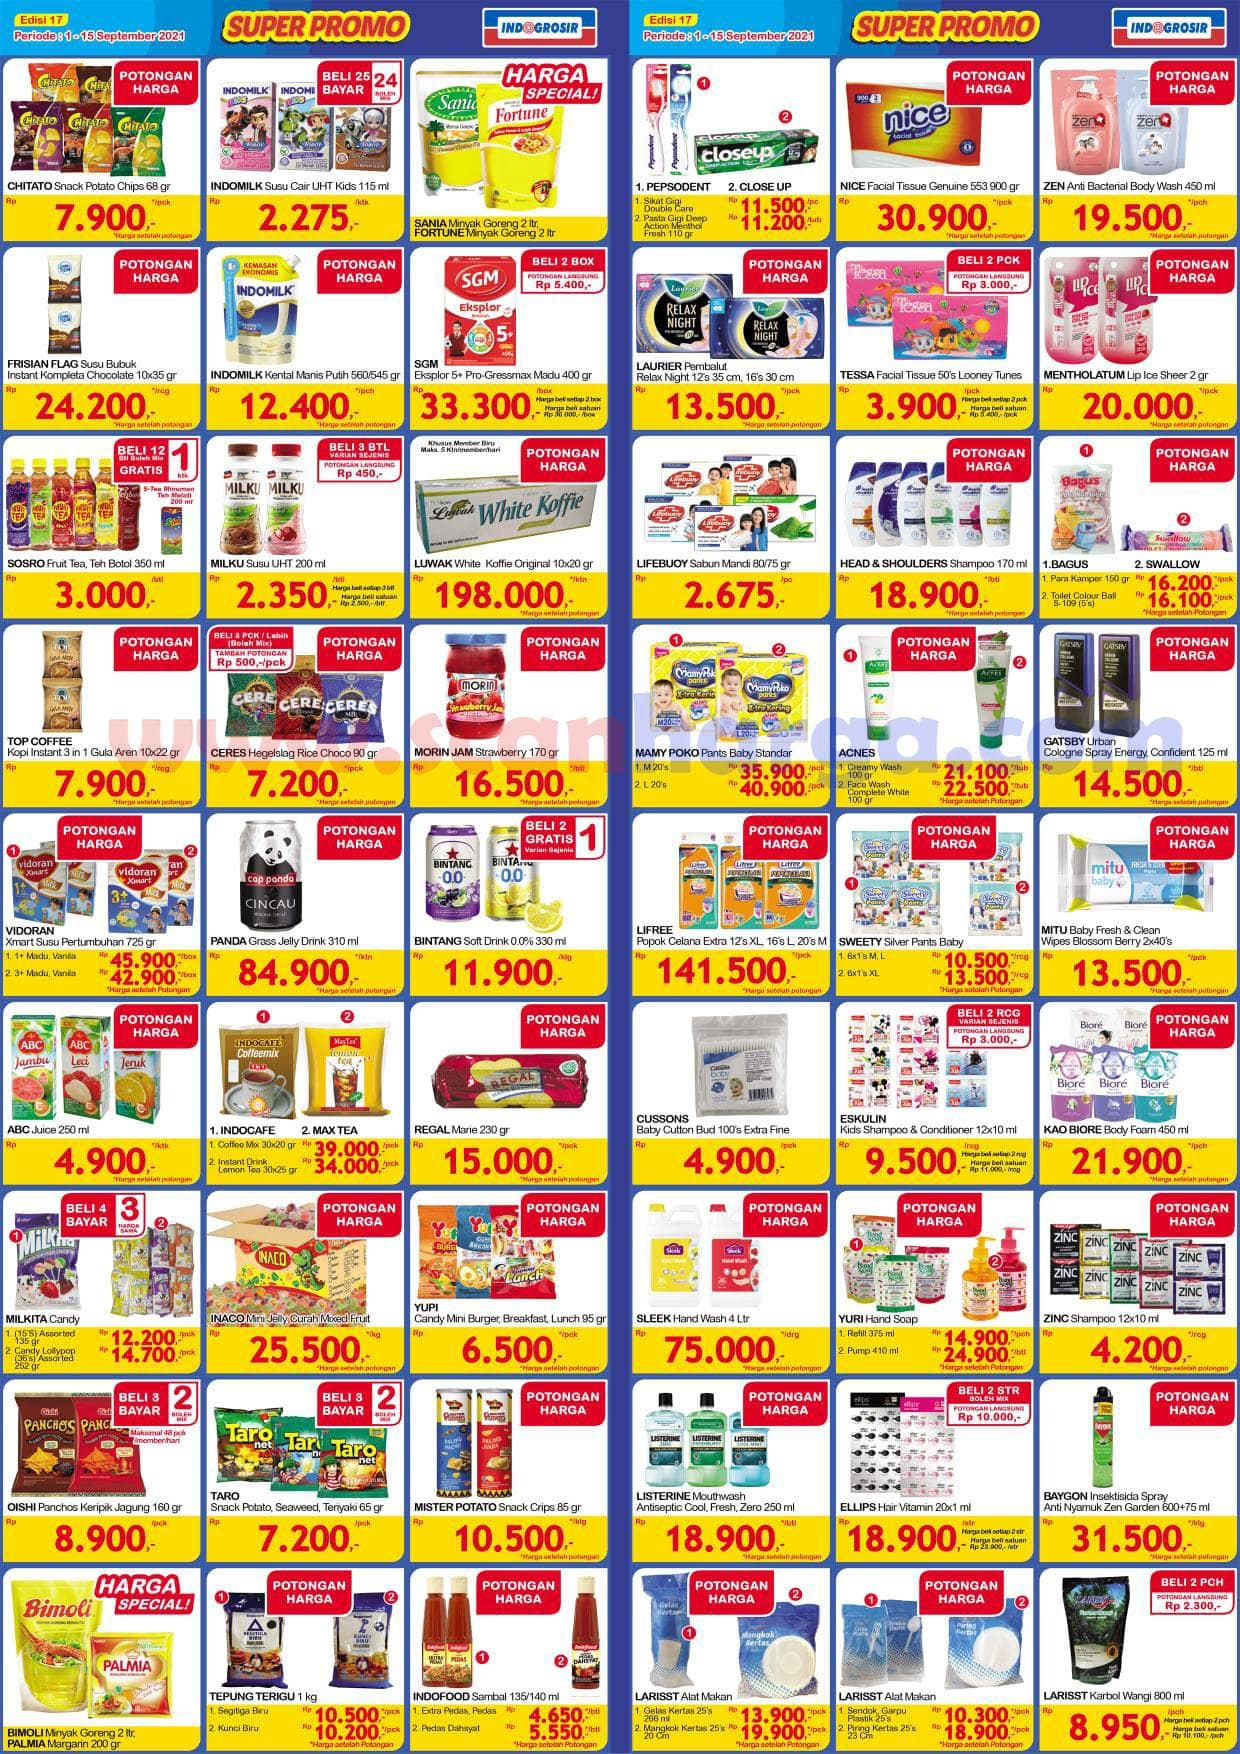 Katalog INDOGROSIR Super Promo Periode 1 - 15 September 2021 2